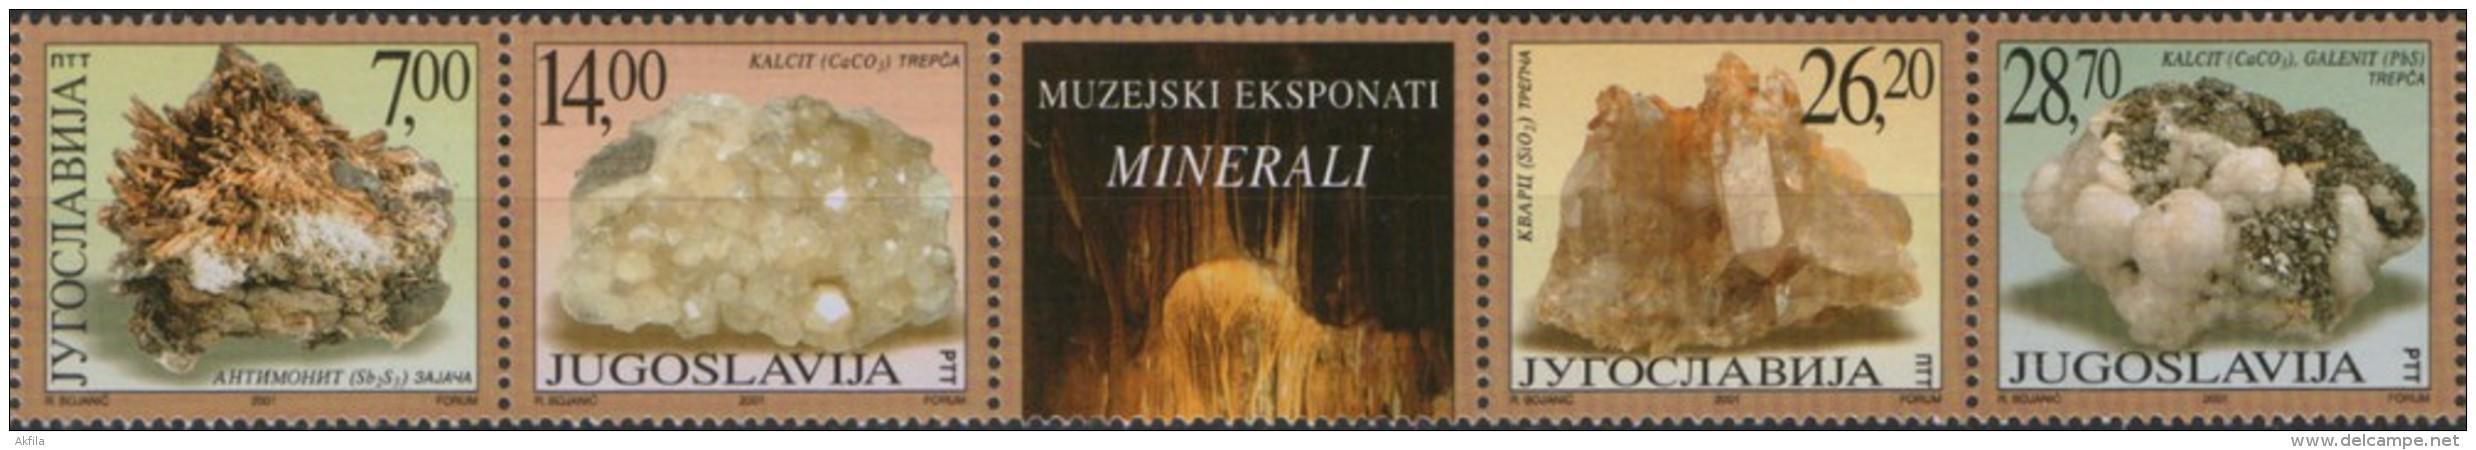 Yugoslavia 2001 Museum Exhibits - Minerals (Stibnite, Calcite, Rock Crystal And Galena), MNH (**) Michel 3047-3050 - Minerals